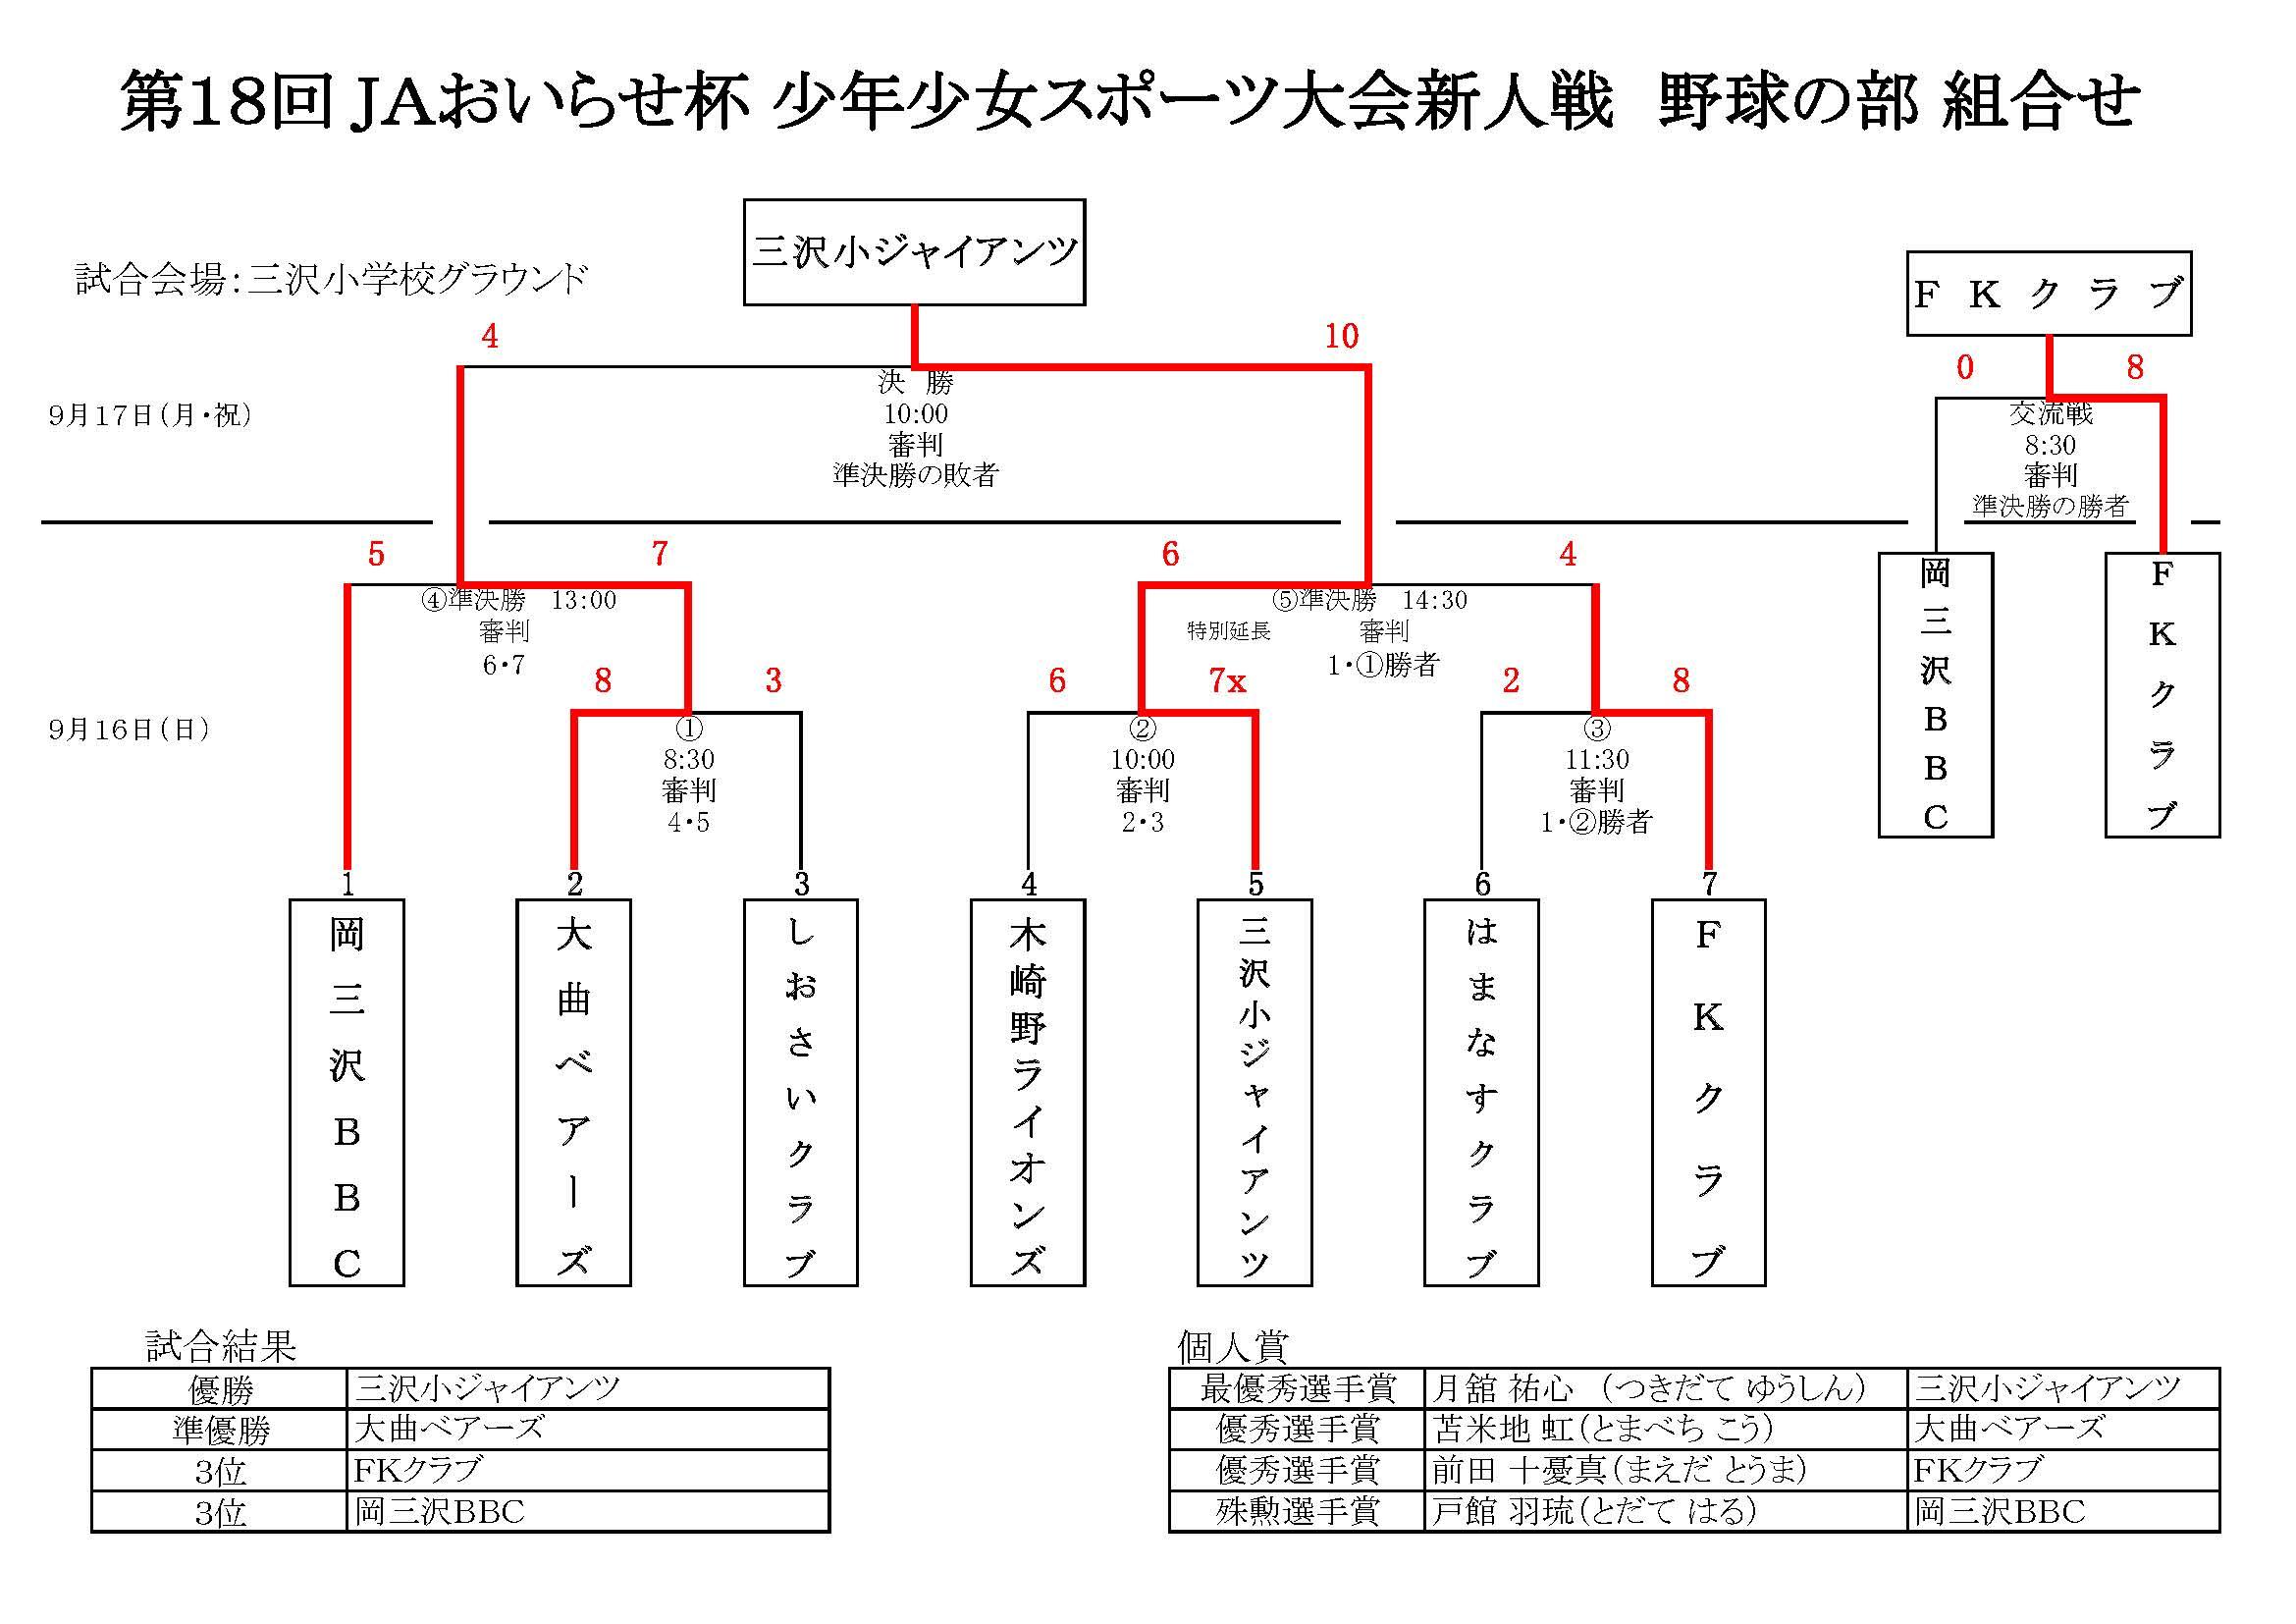 ja_shinjin2018_k